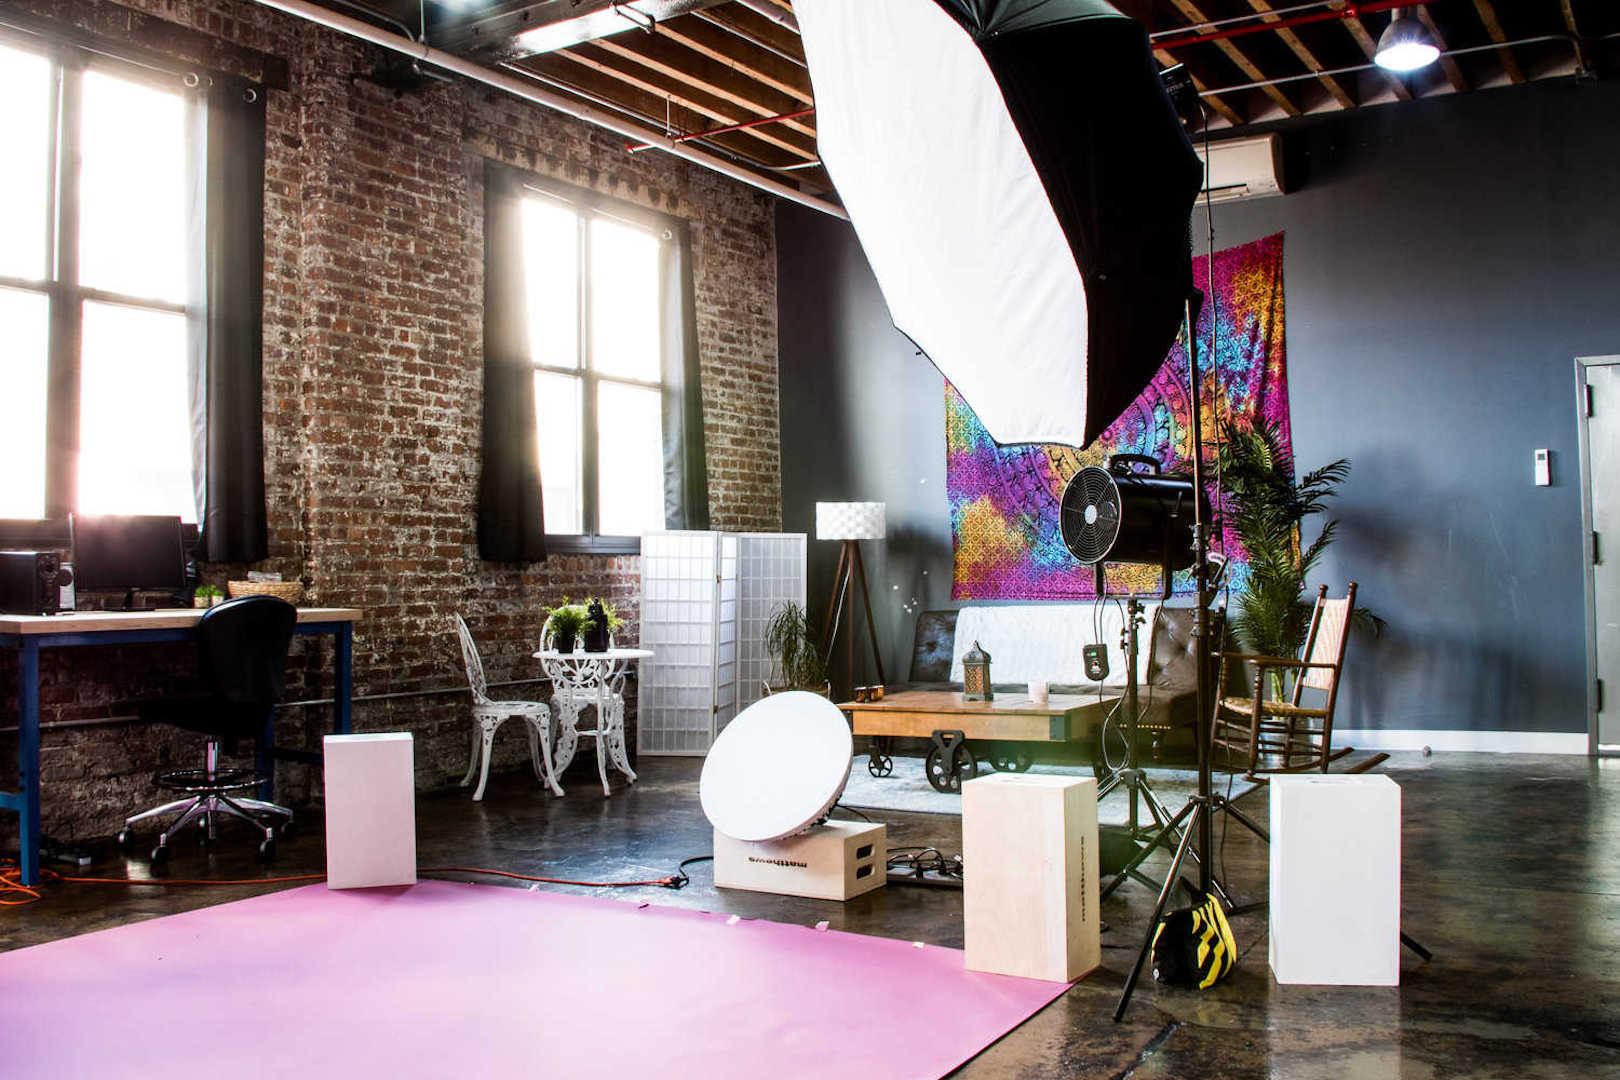 bushwick-photo-studio-rental-5